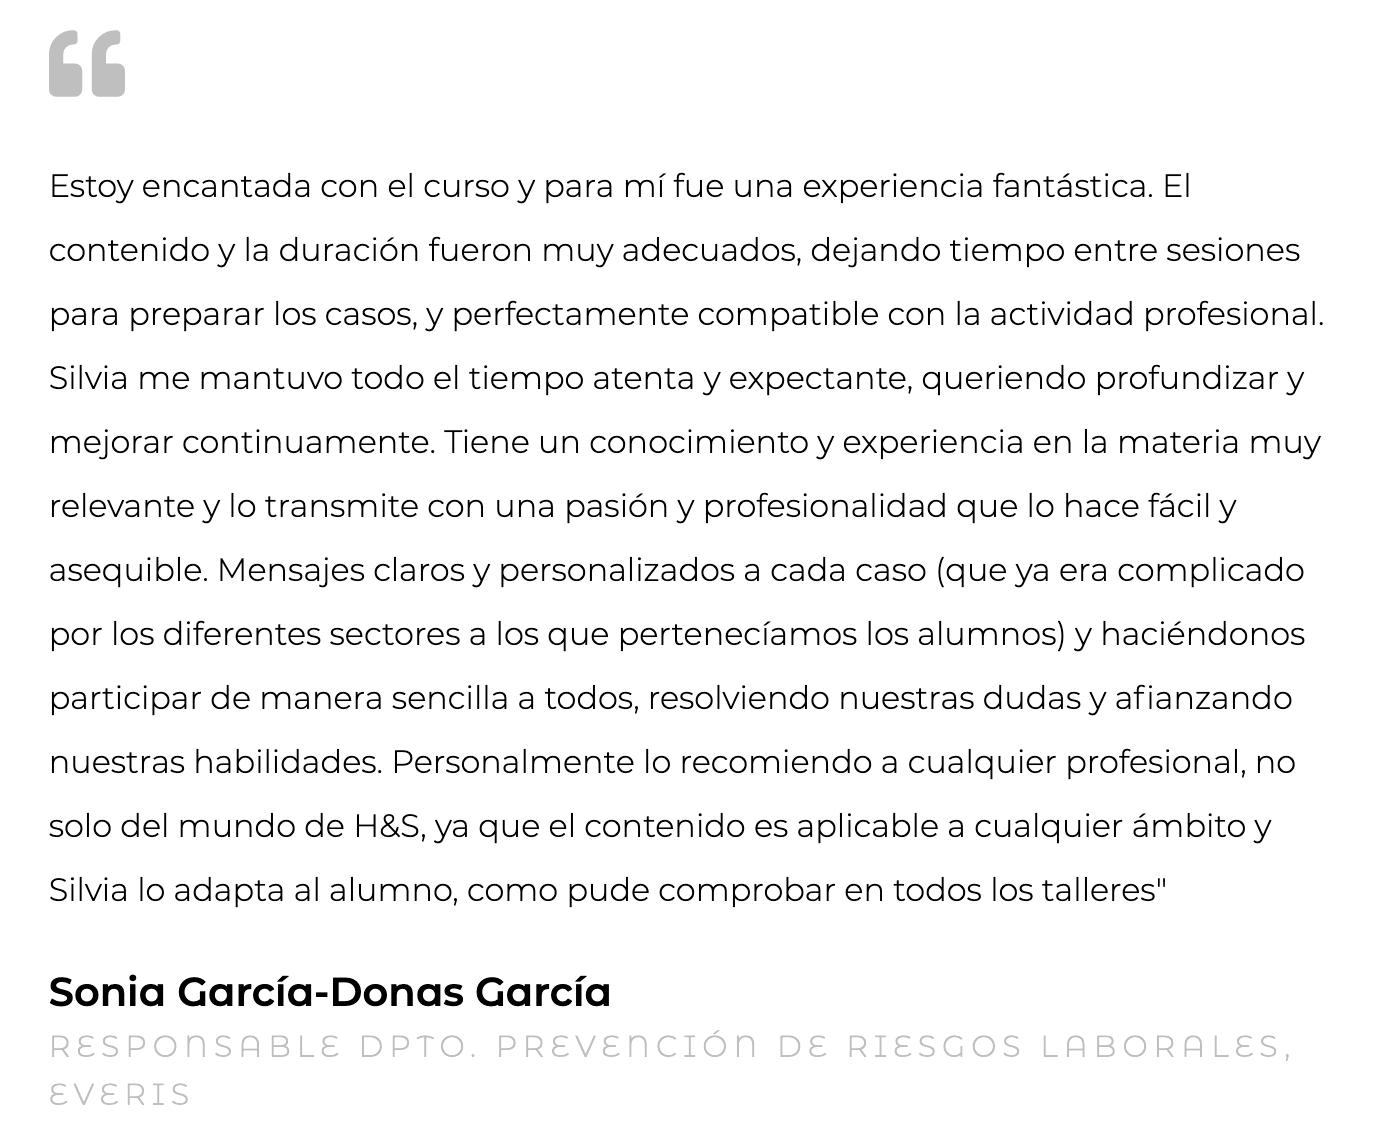 Silvia Oceransky Cultura Preventiva opiniones Sonia Garcia-Donas